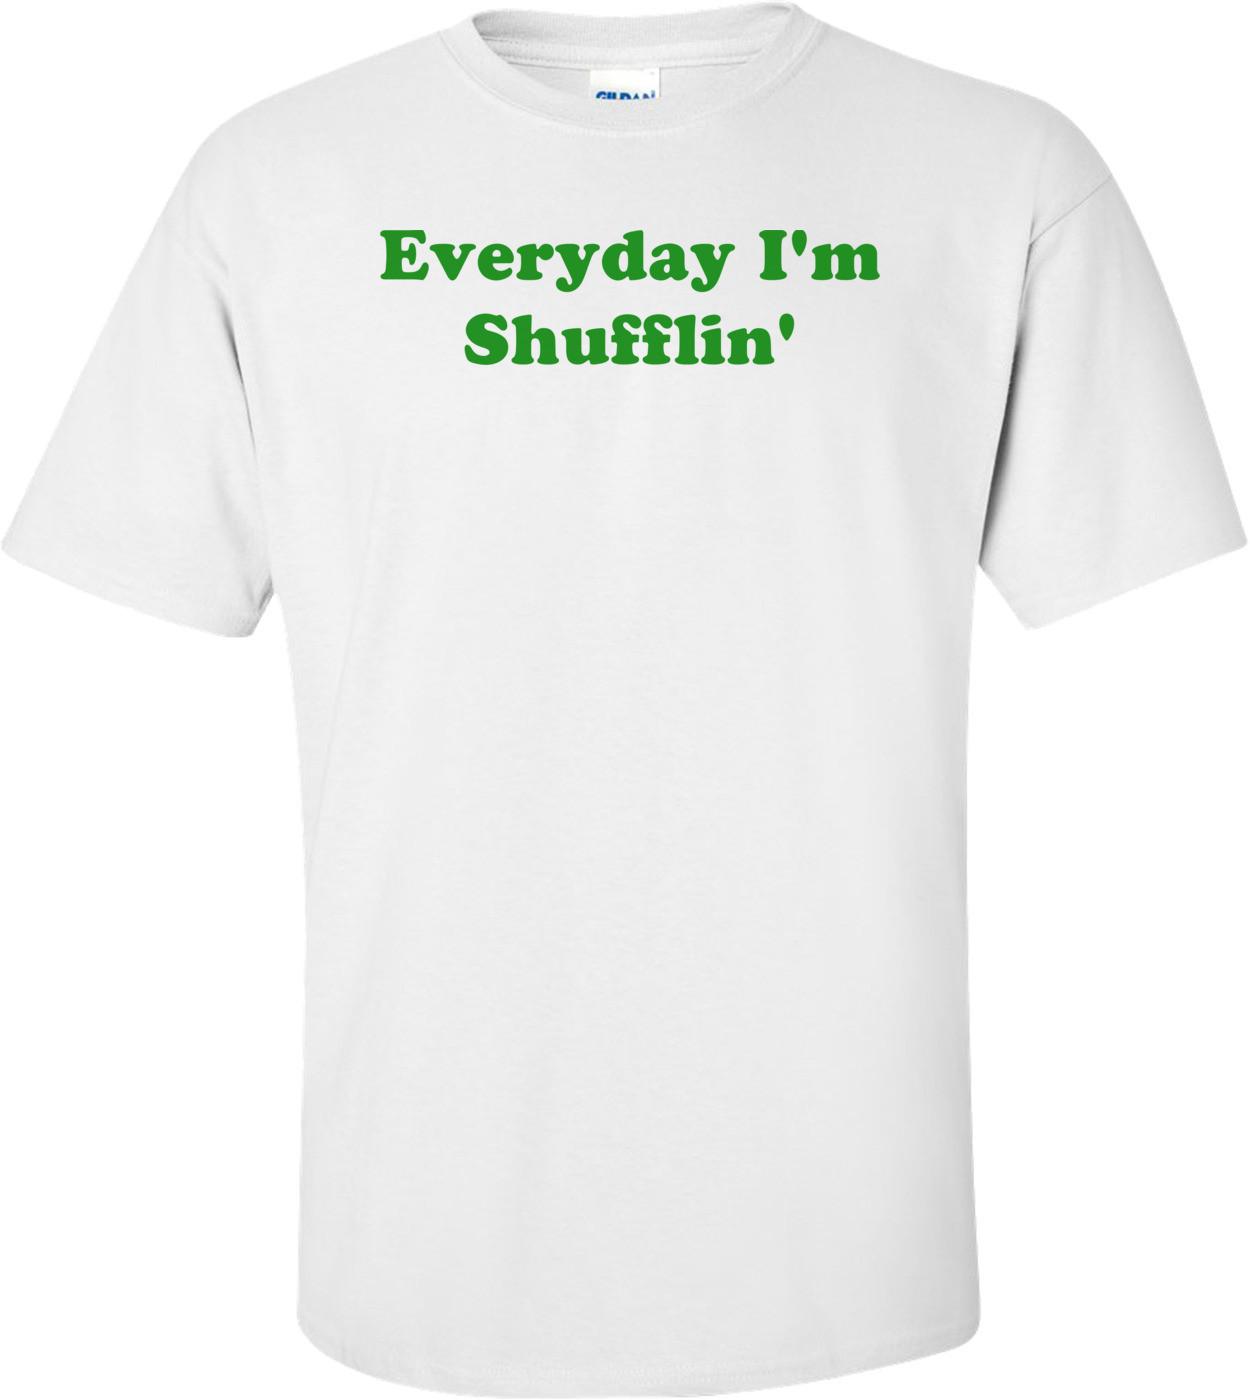 Everyday I'm Shufflin' Shirt